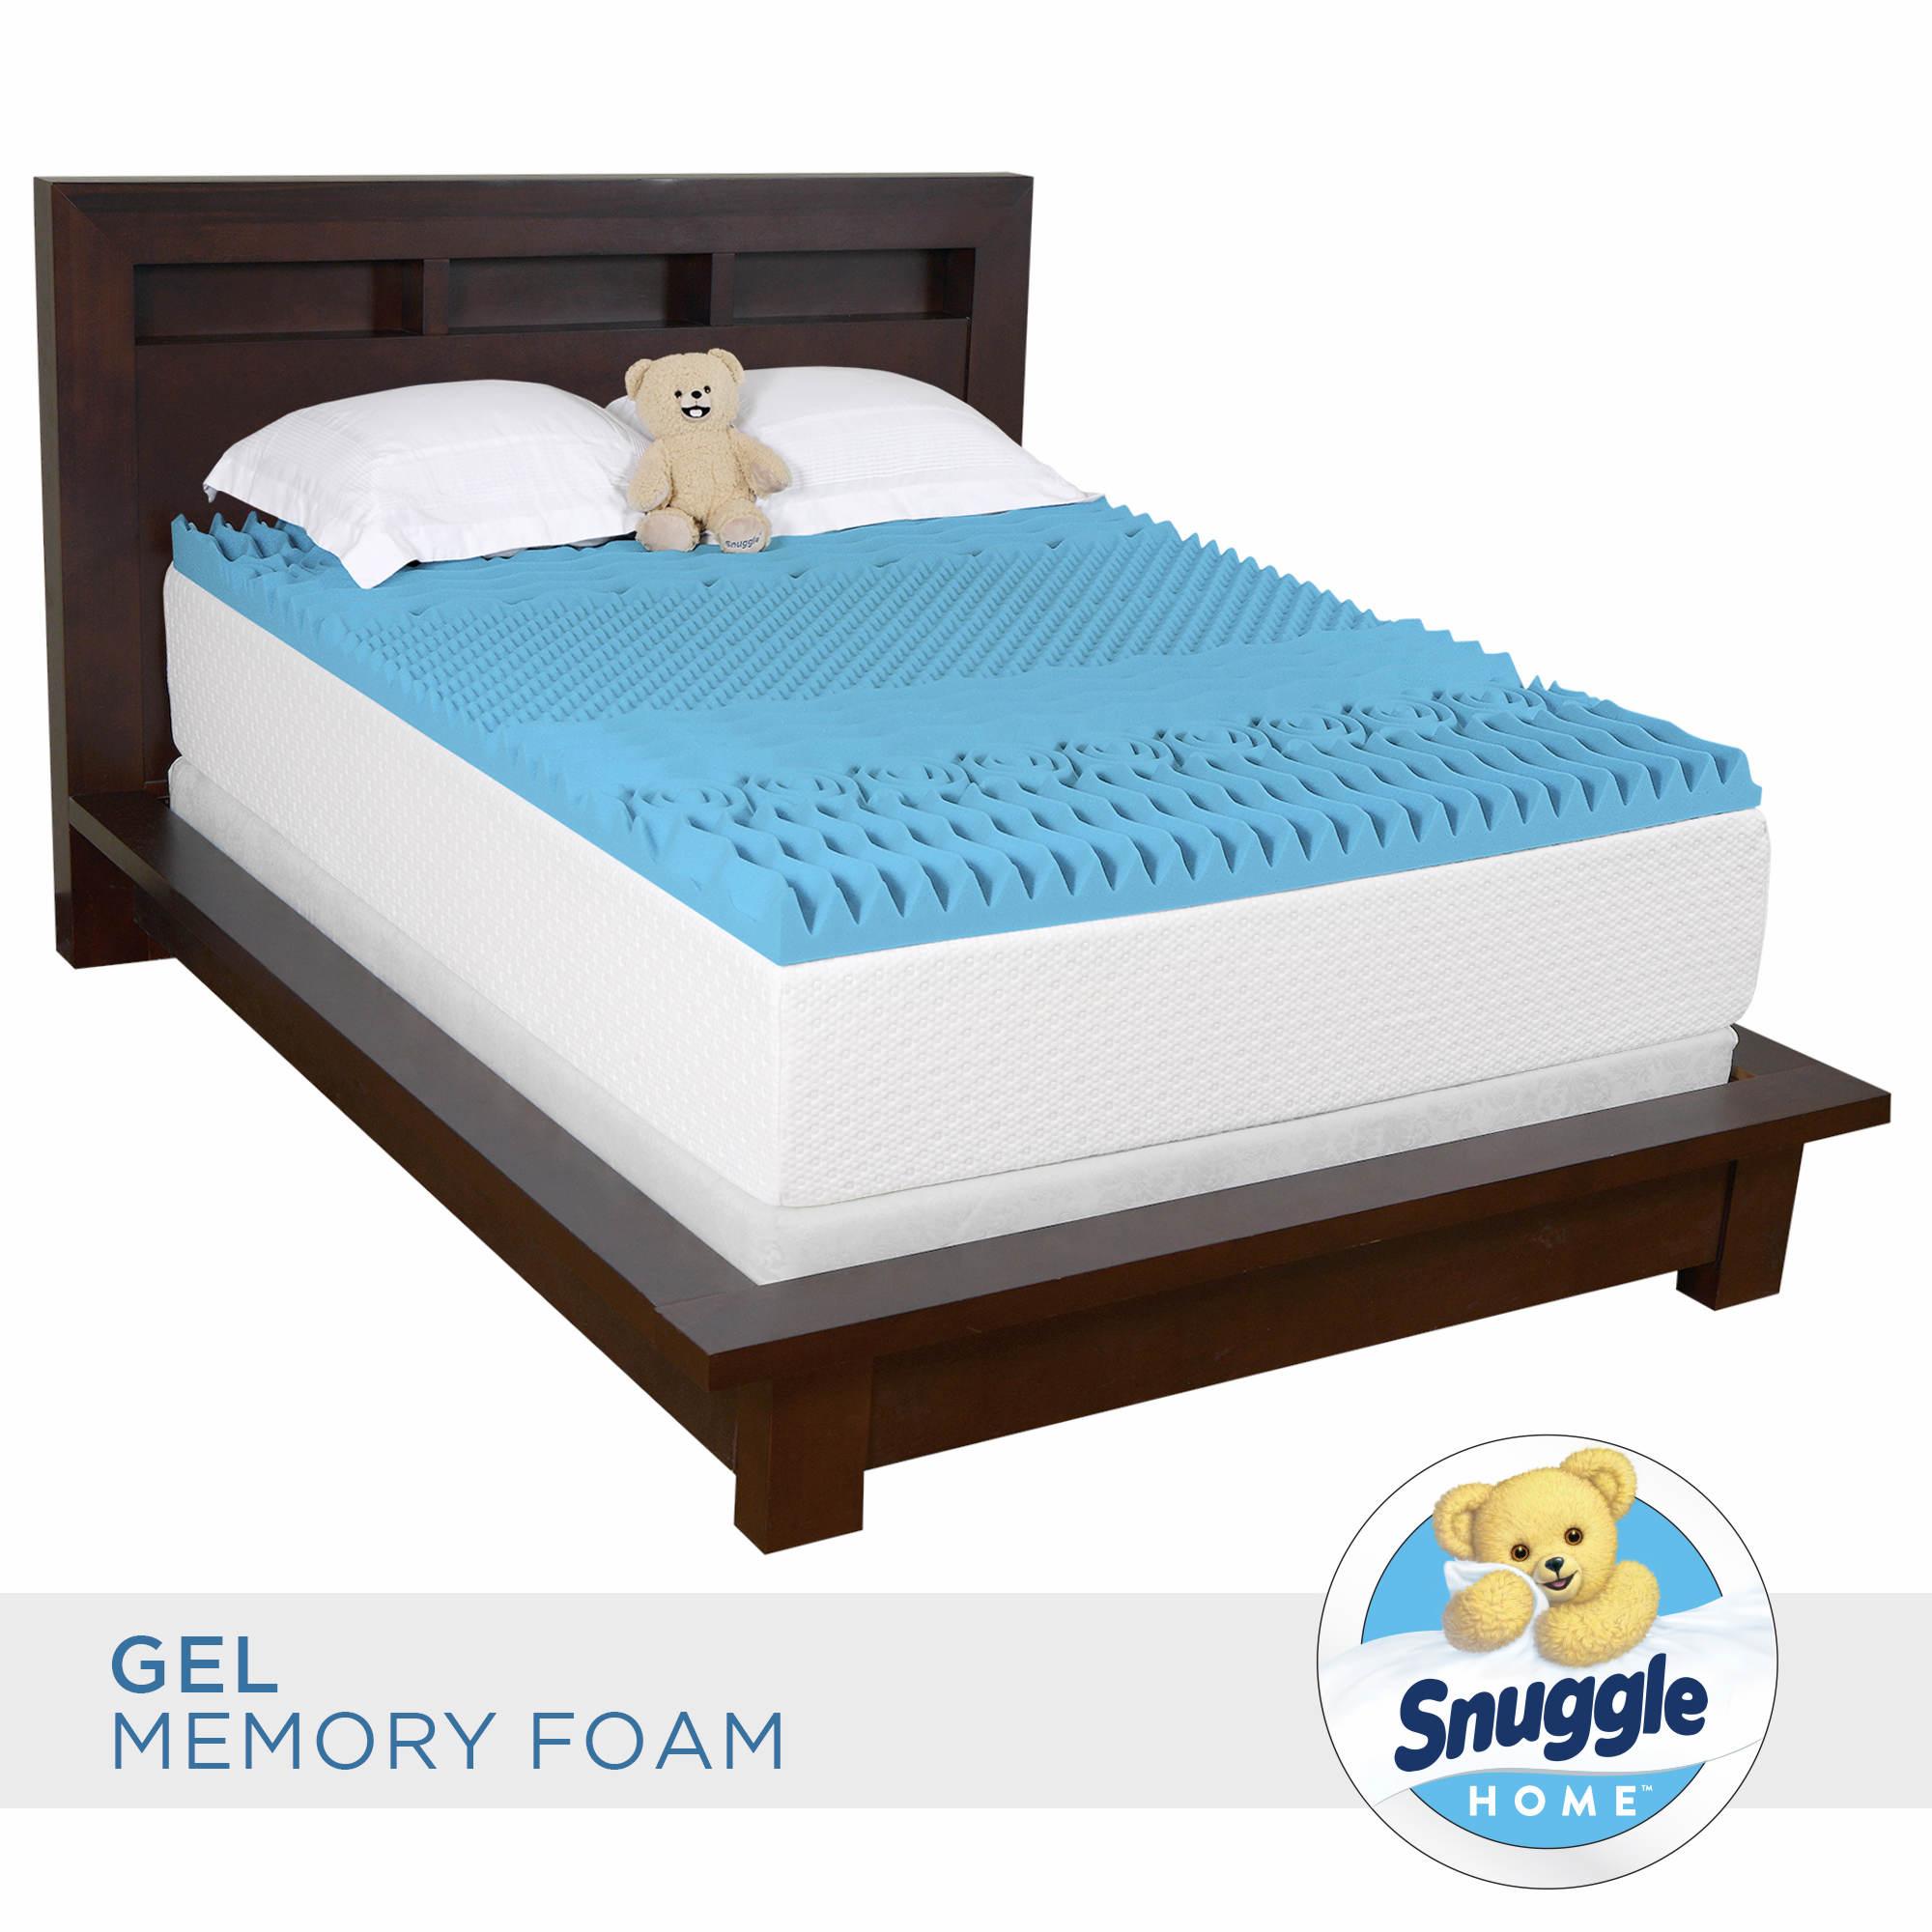 Snuggle Home Full Size 3 Quot Gel Memory Foam 7 Zone Mattress